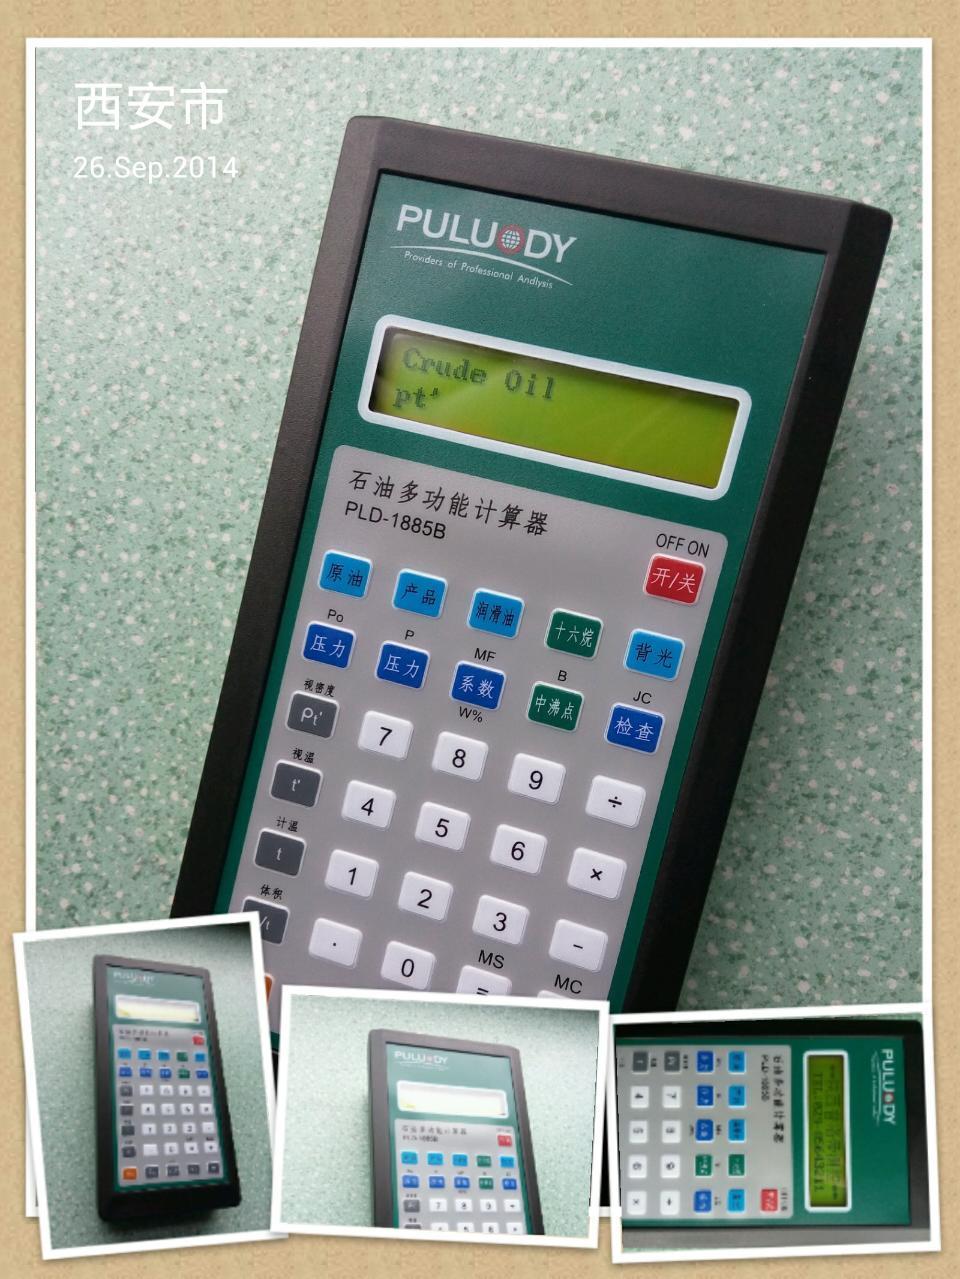 PLD-1885B石油多功能计算器